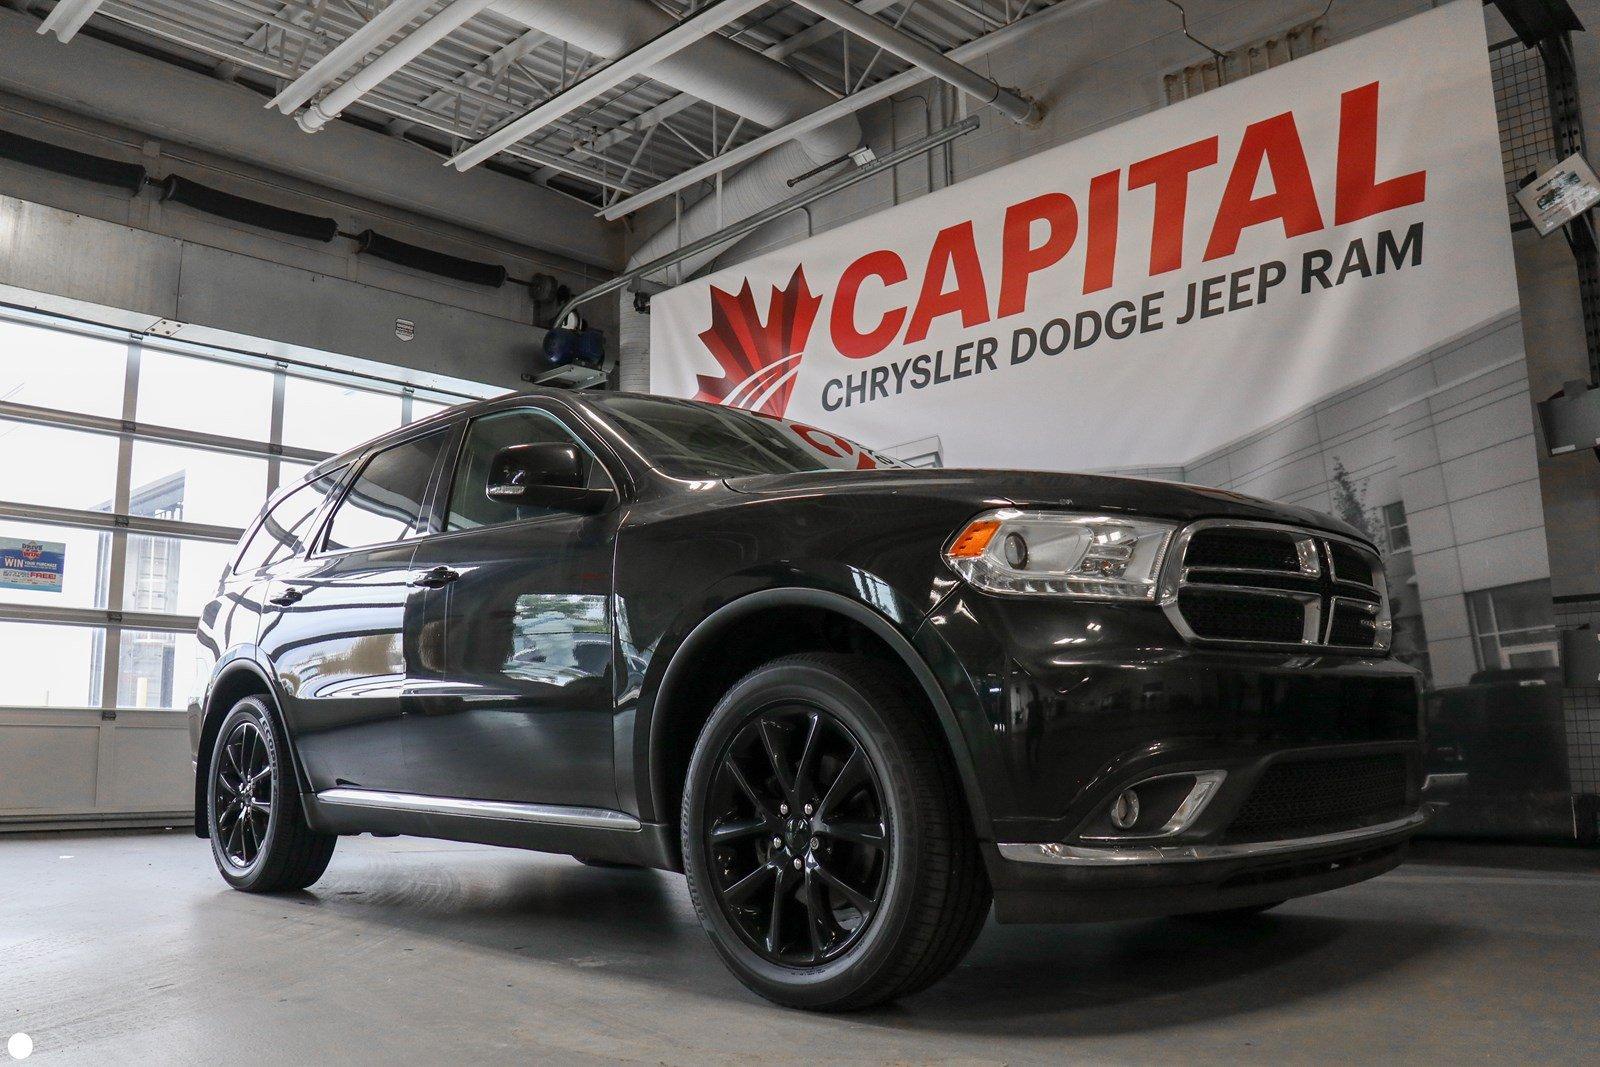 2015 Dodge Durango Limited AWD | Power Sunroof | GPS Navigation | SUV